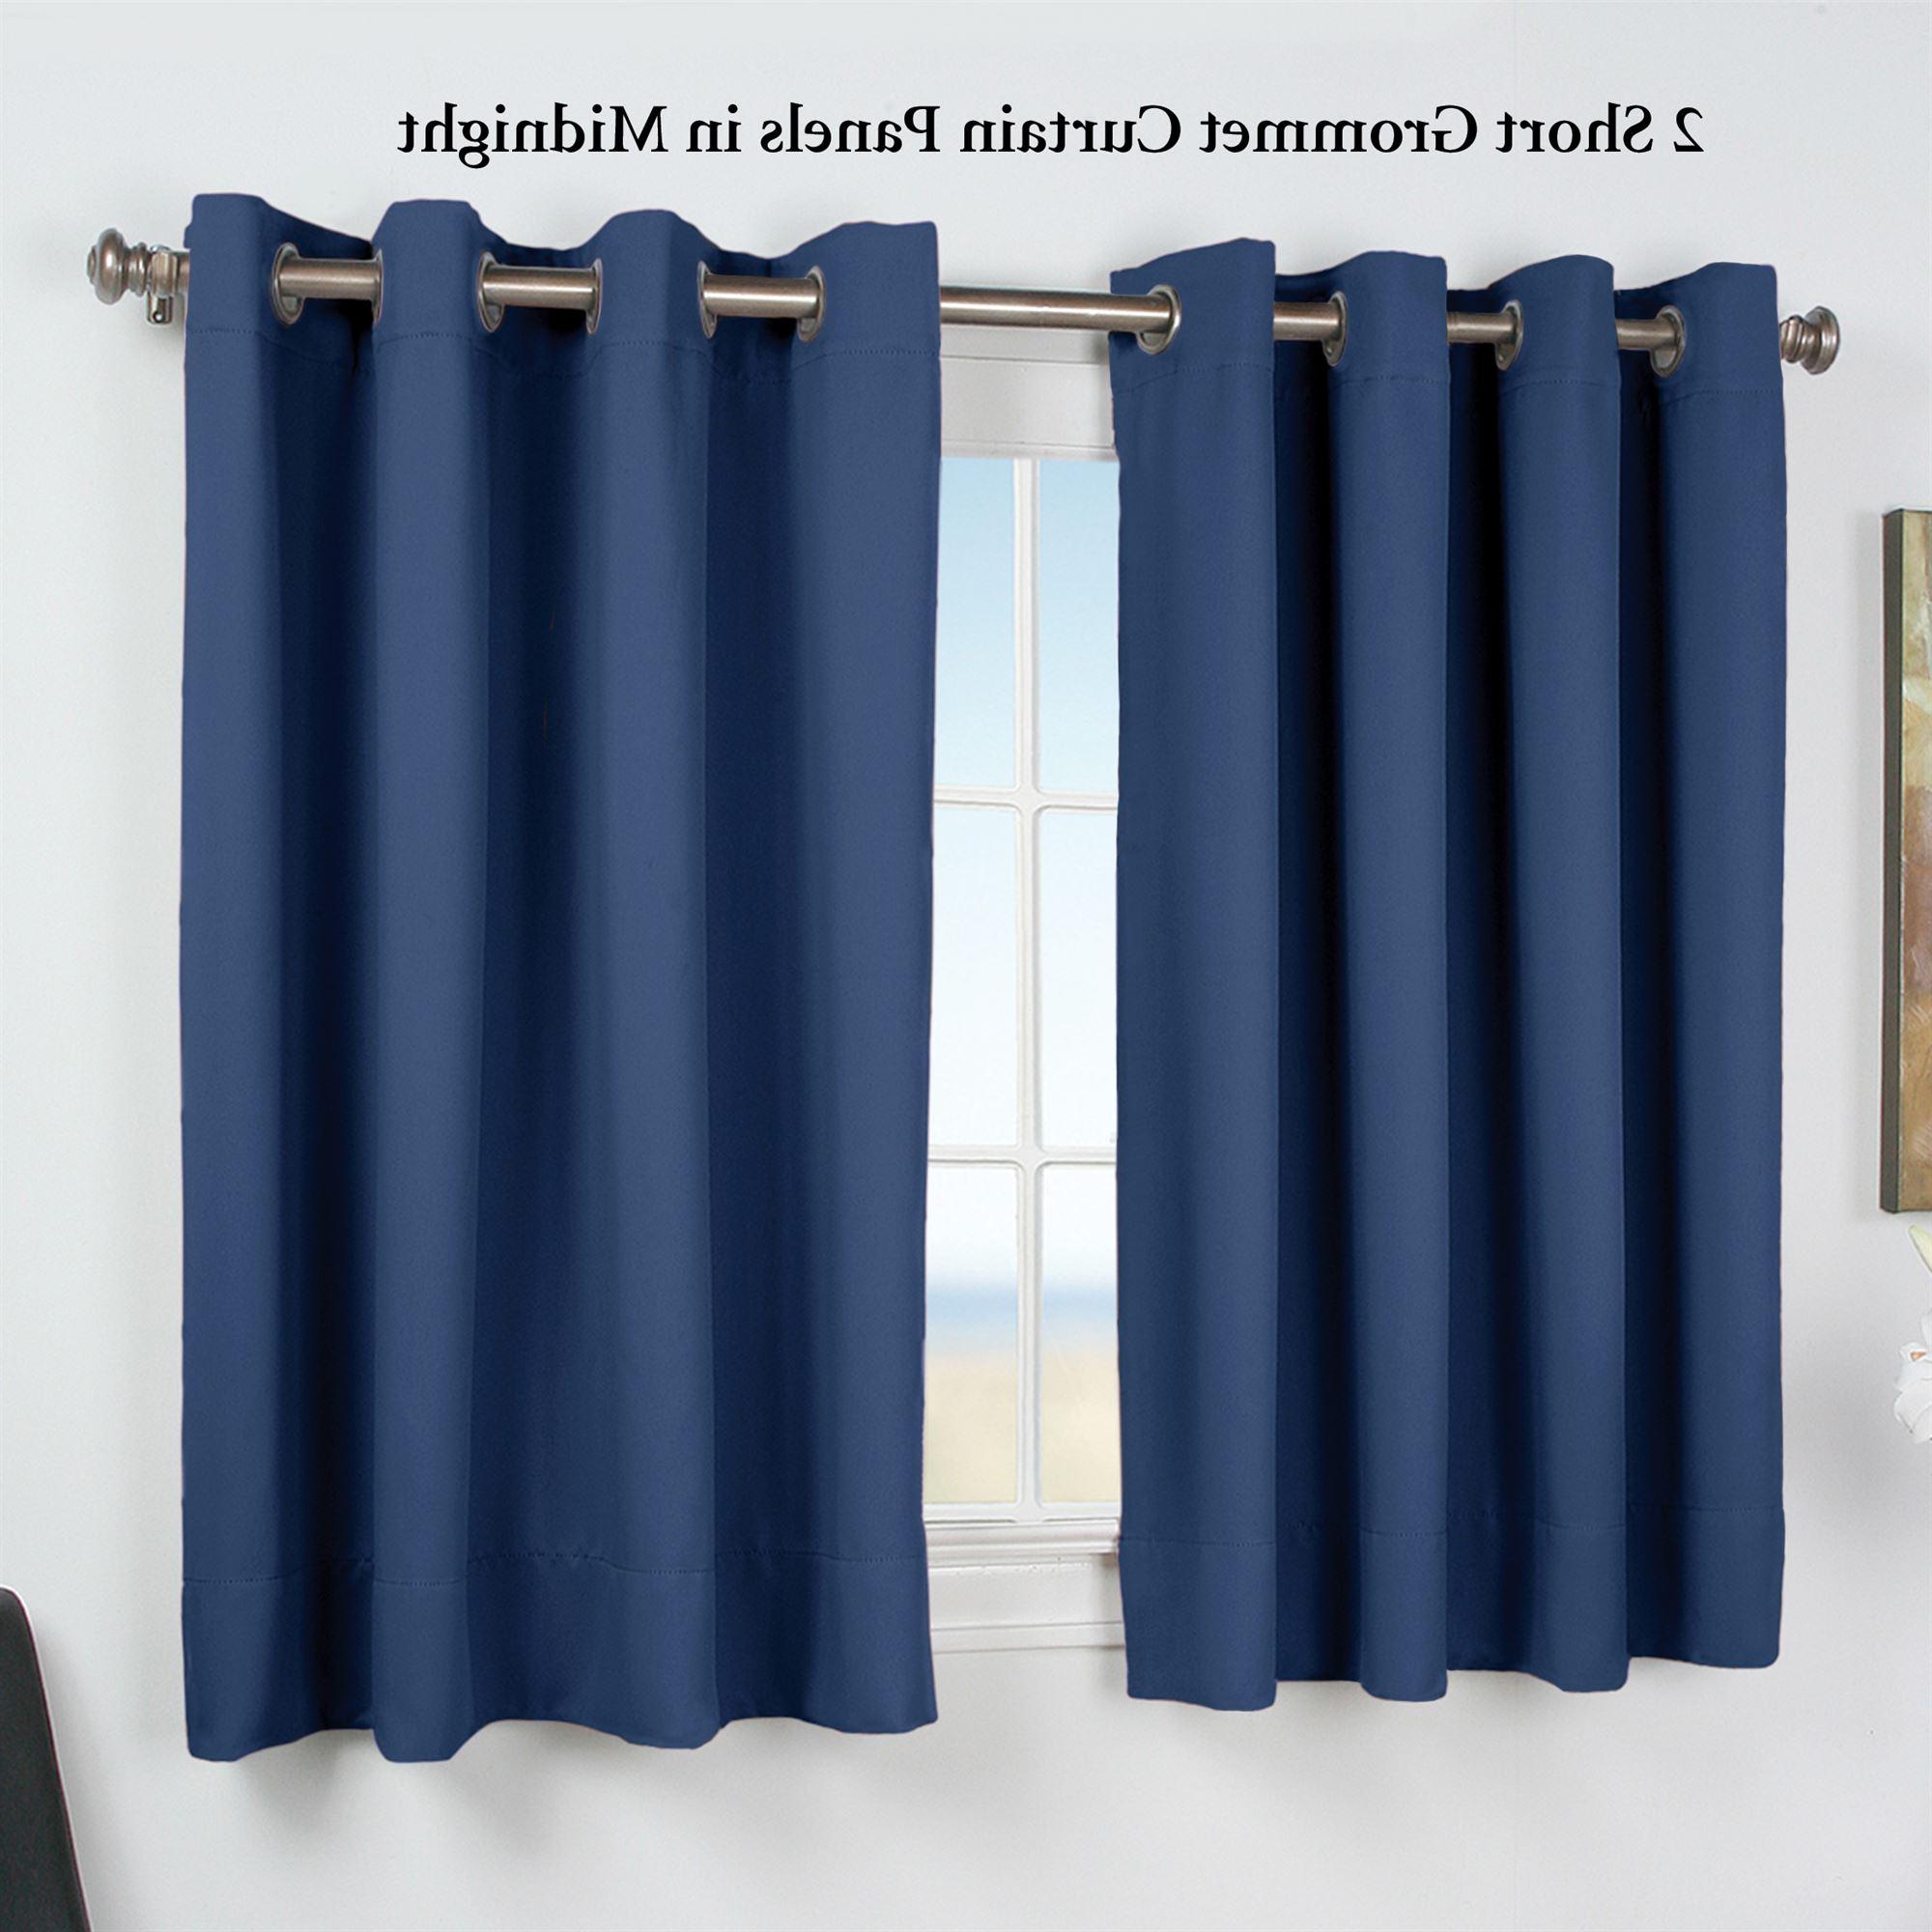 Fashionable Ultimate Blackout Short Length Grommet Curtain Panels Within Ultimate Blackout Short Grommet Curtain Panel (View 8 of 20)